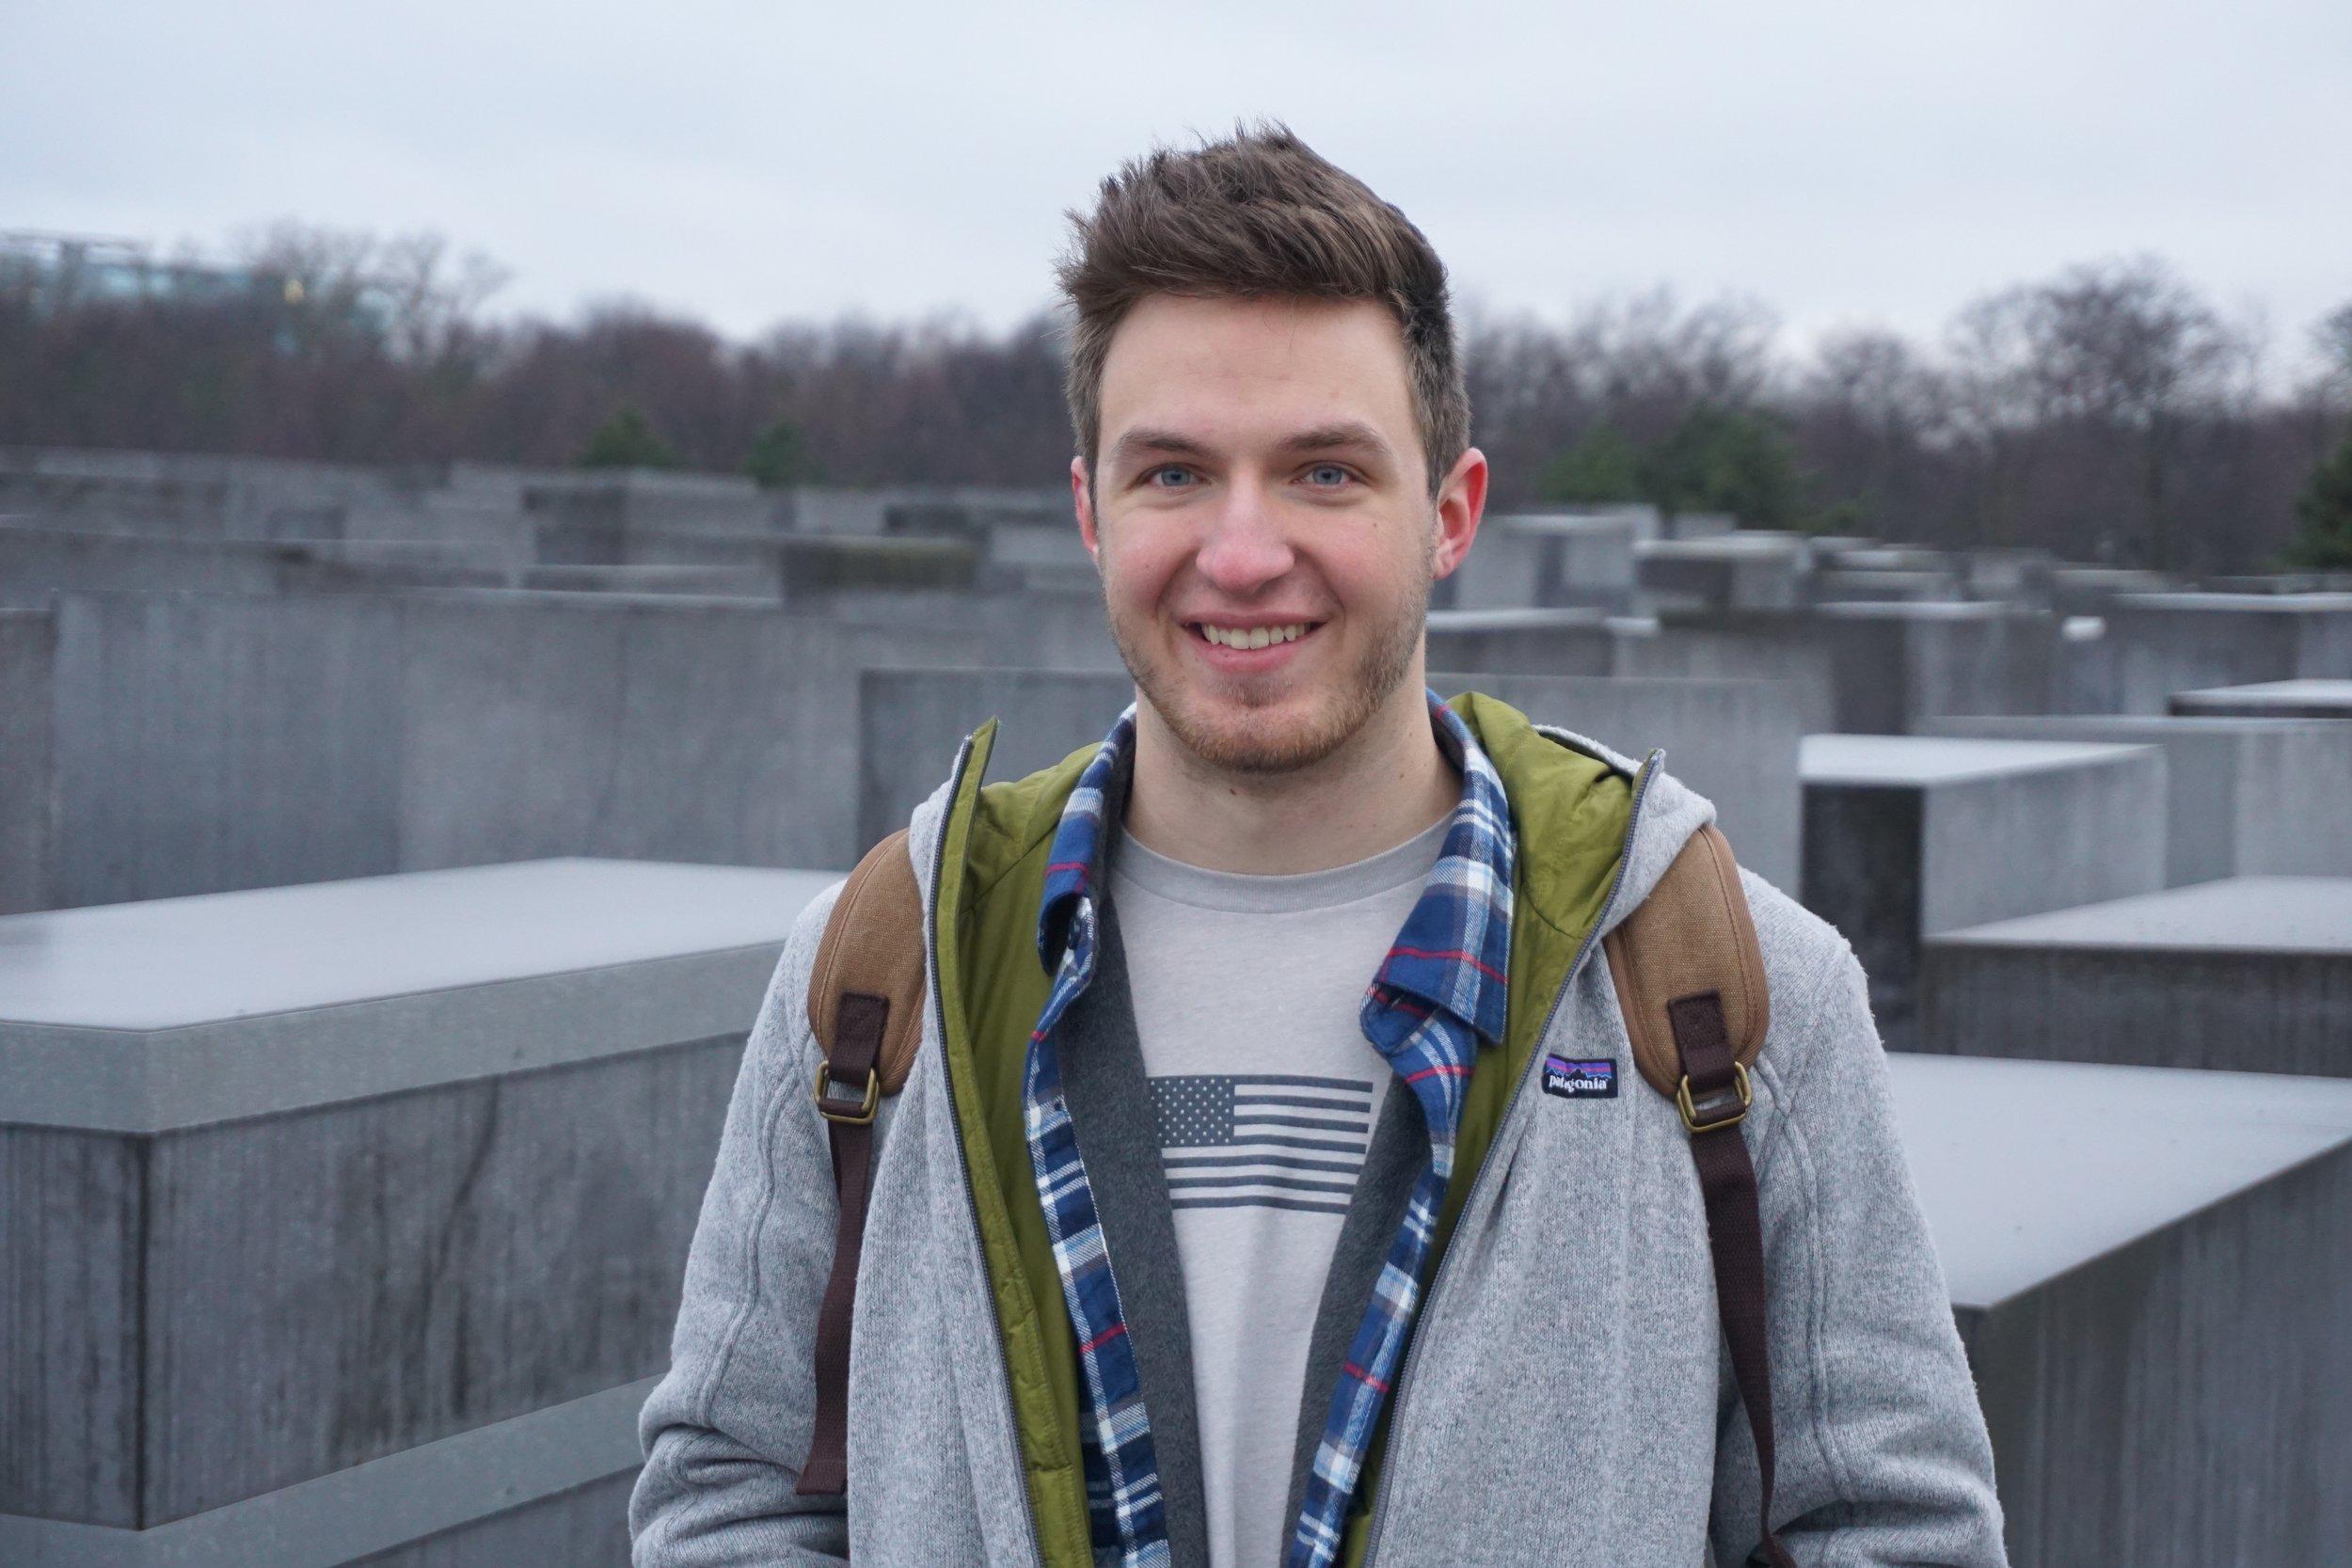 Jacob - New York CityKPMG Audit AssociateTraveler